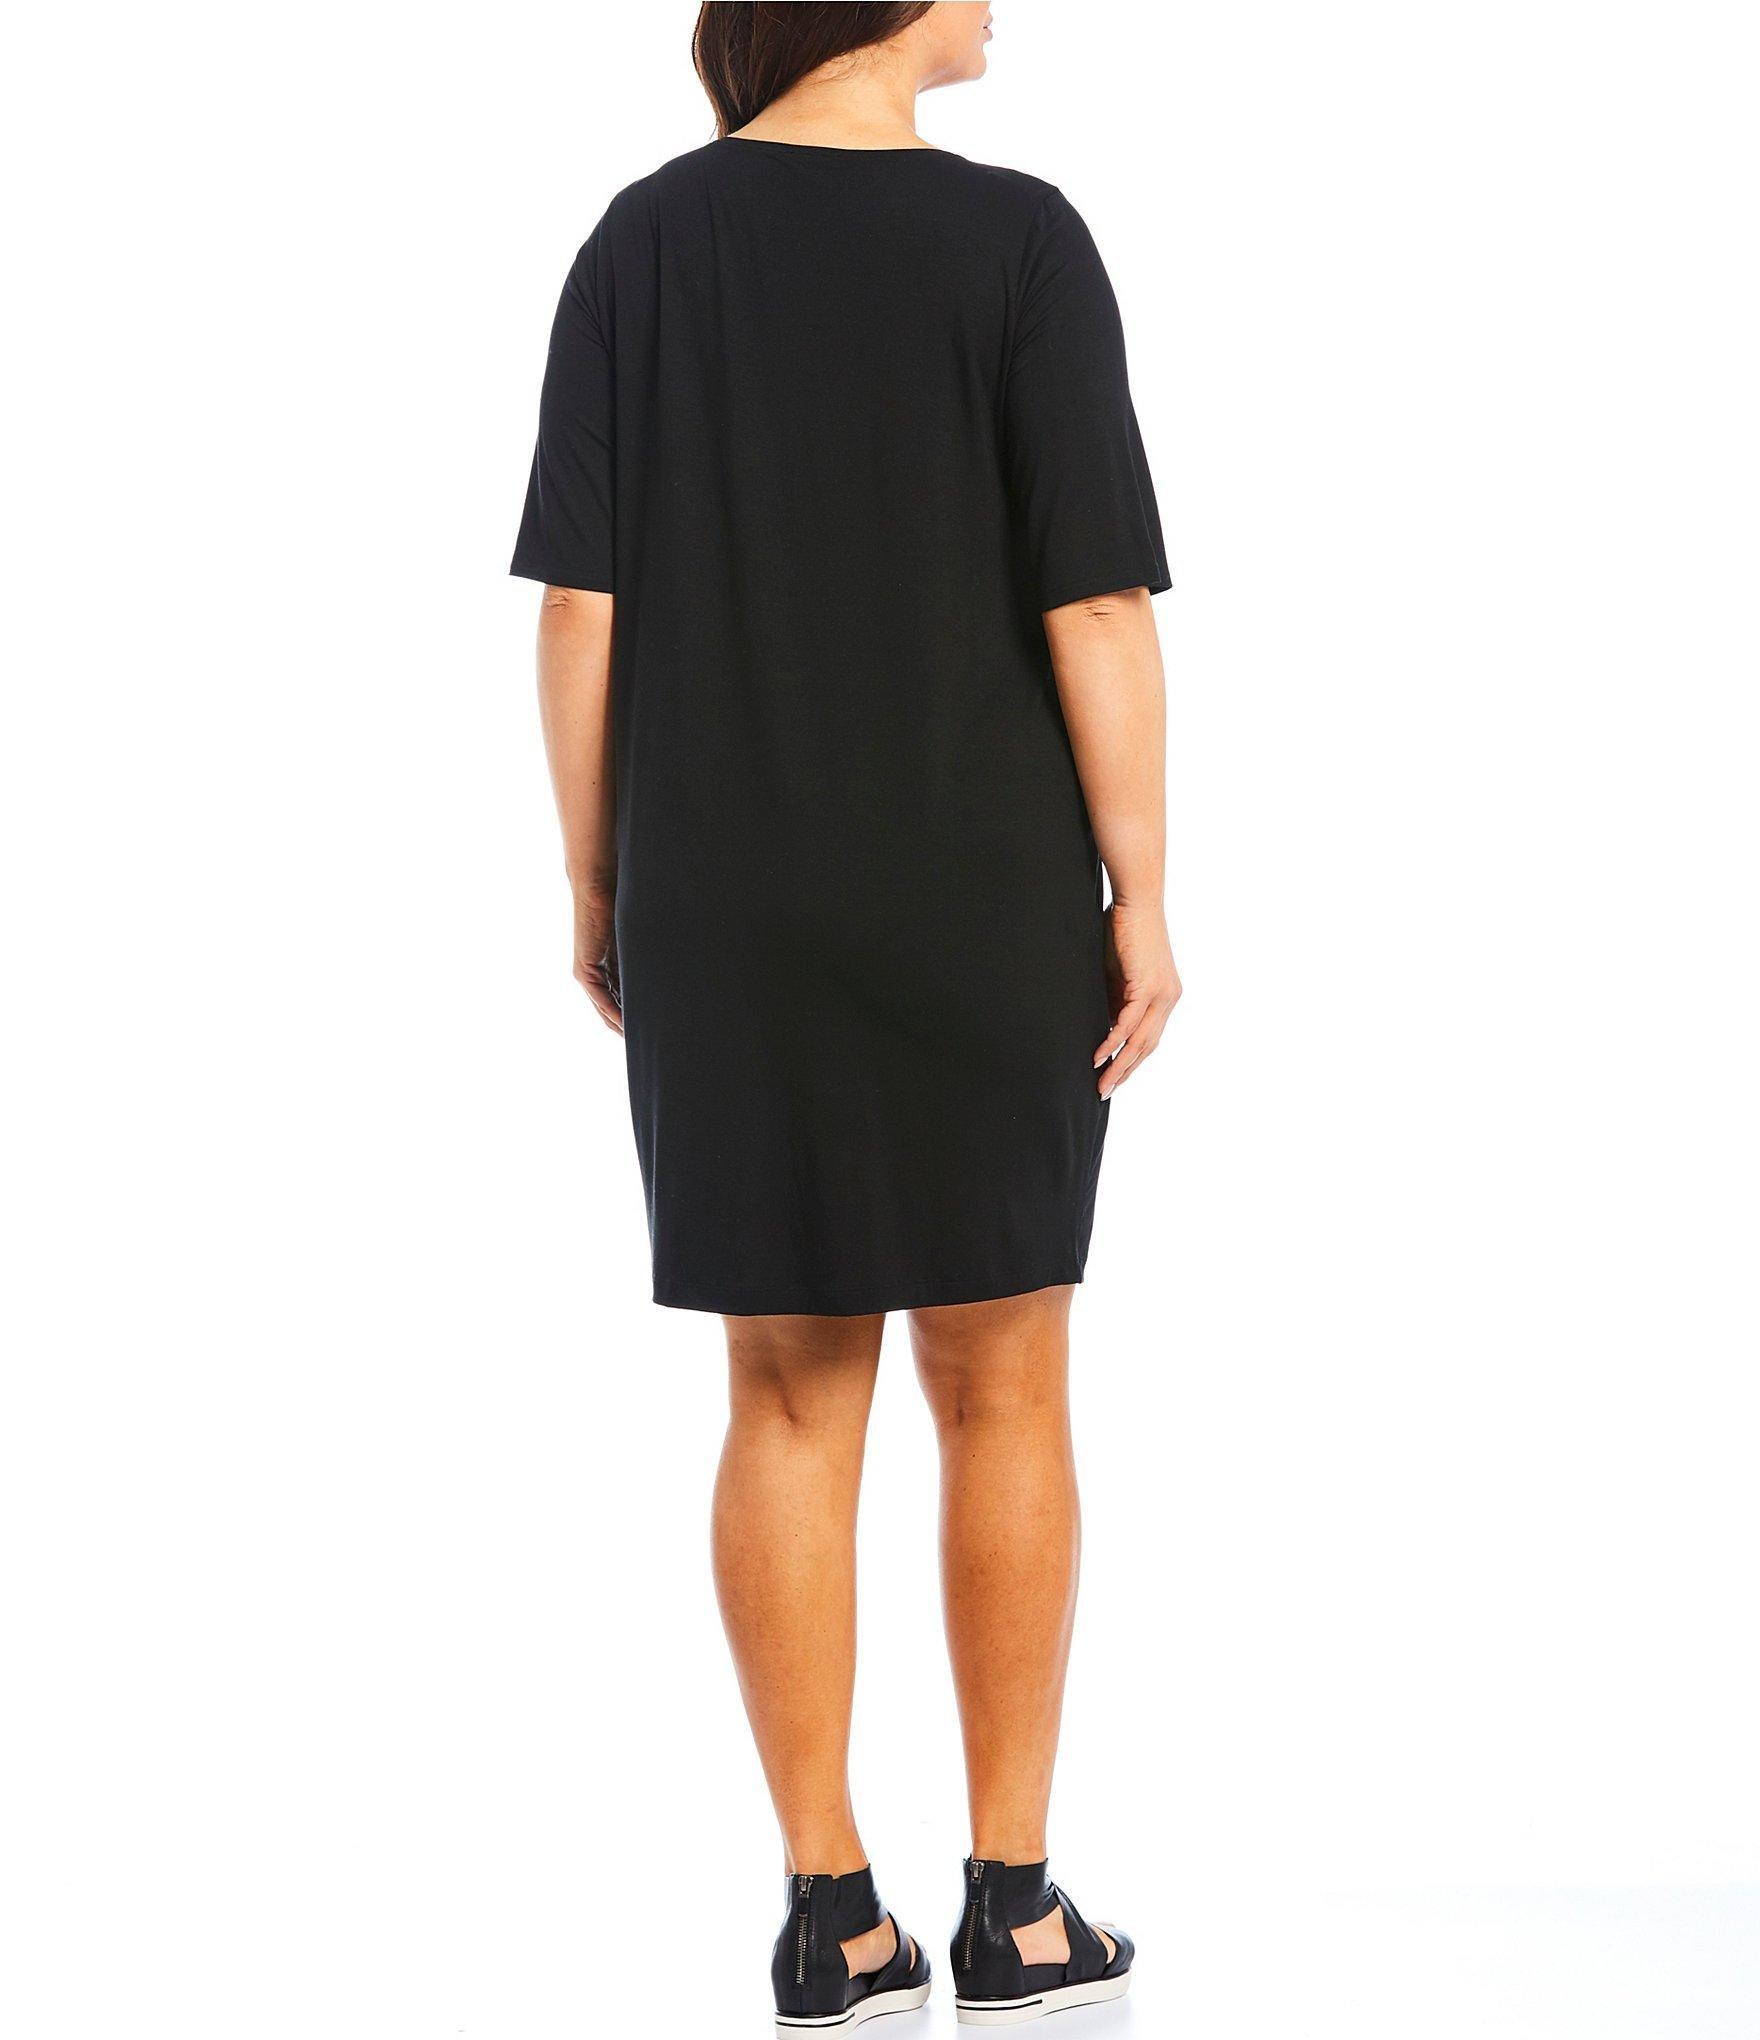 4fa0cf55c8d Eileen Fisher - Black Plus Size V-neck Elbow Sleeve Shift Dress - Lyst.  View fullscreen